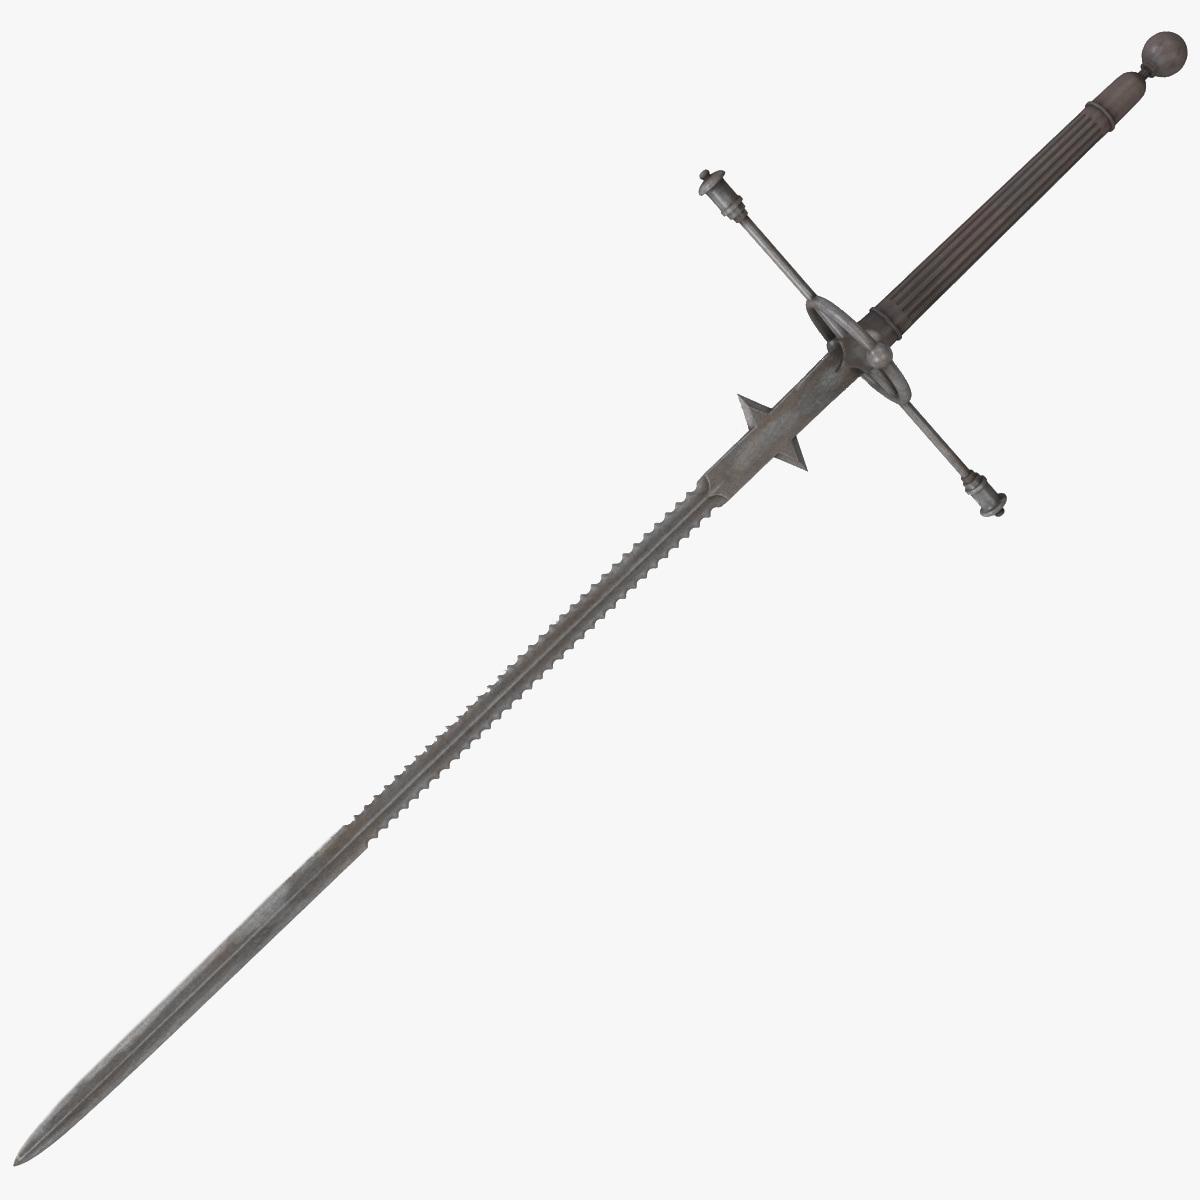 Zweihander Sword max zweihander sword